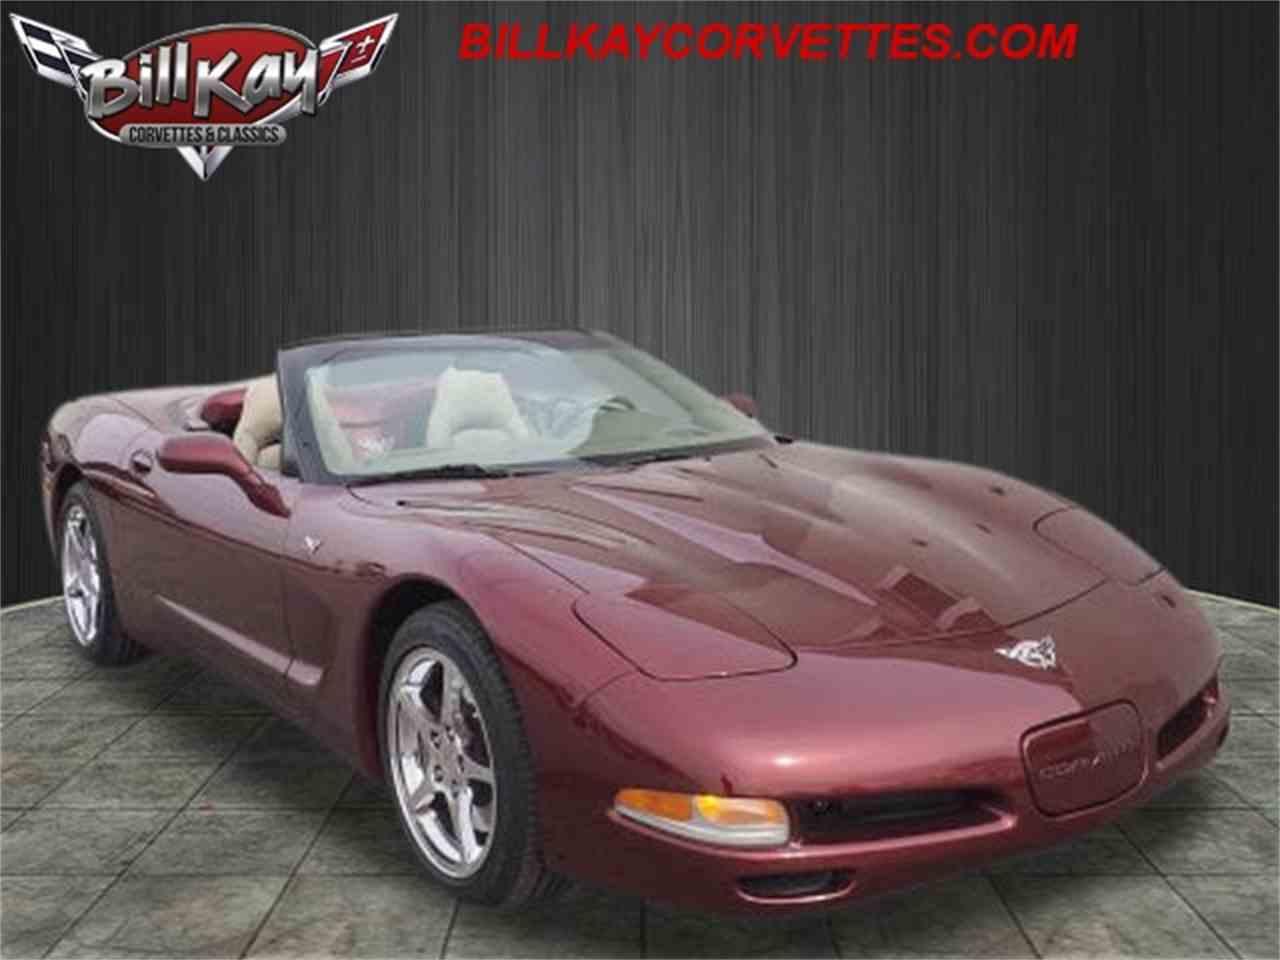 Corvette chevy corvette 2003 : 2003 Chevrolet Corvette for Sale | ClassicCars.com | CC-1068736